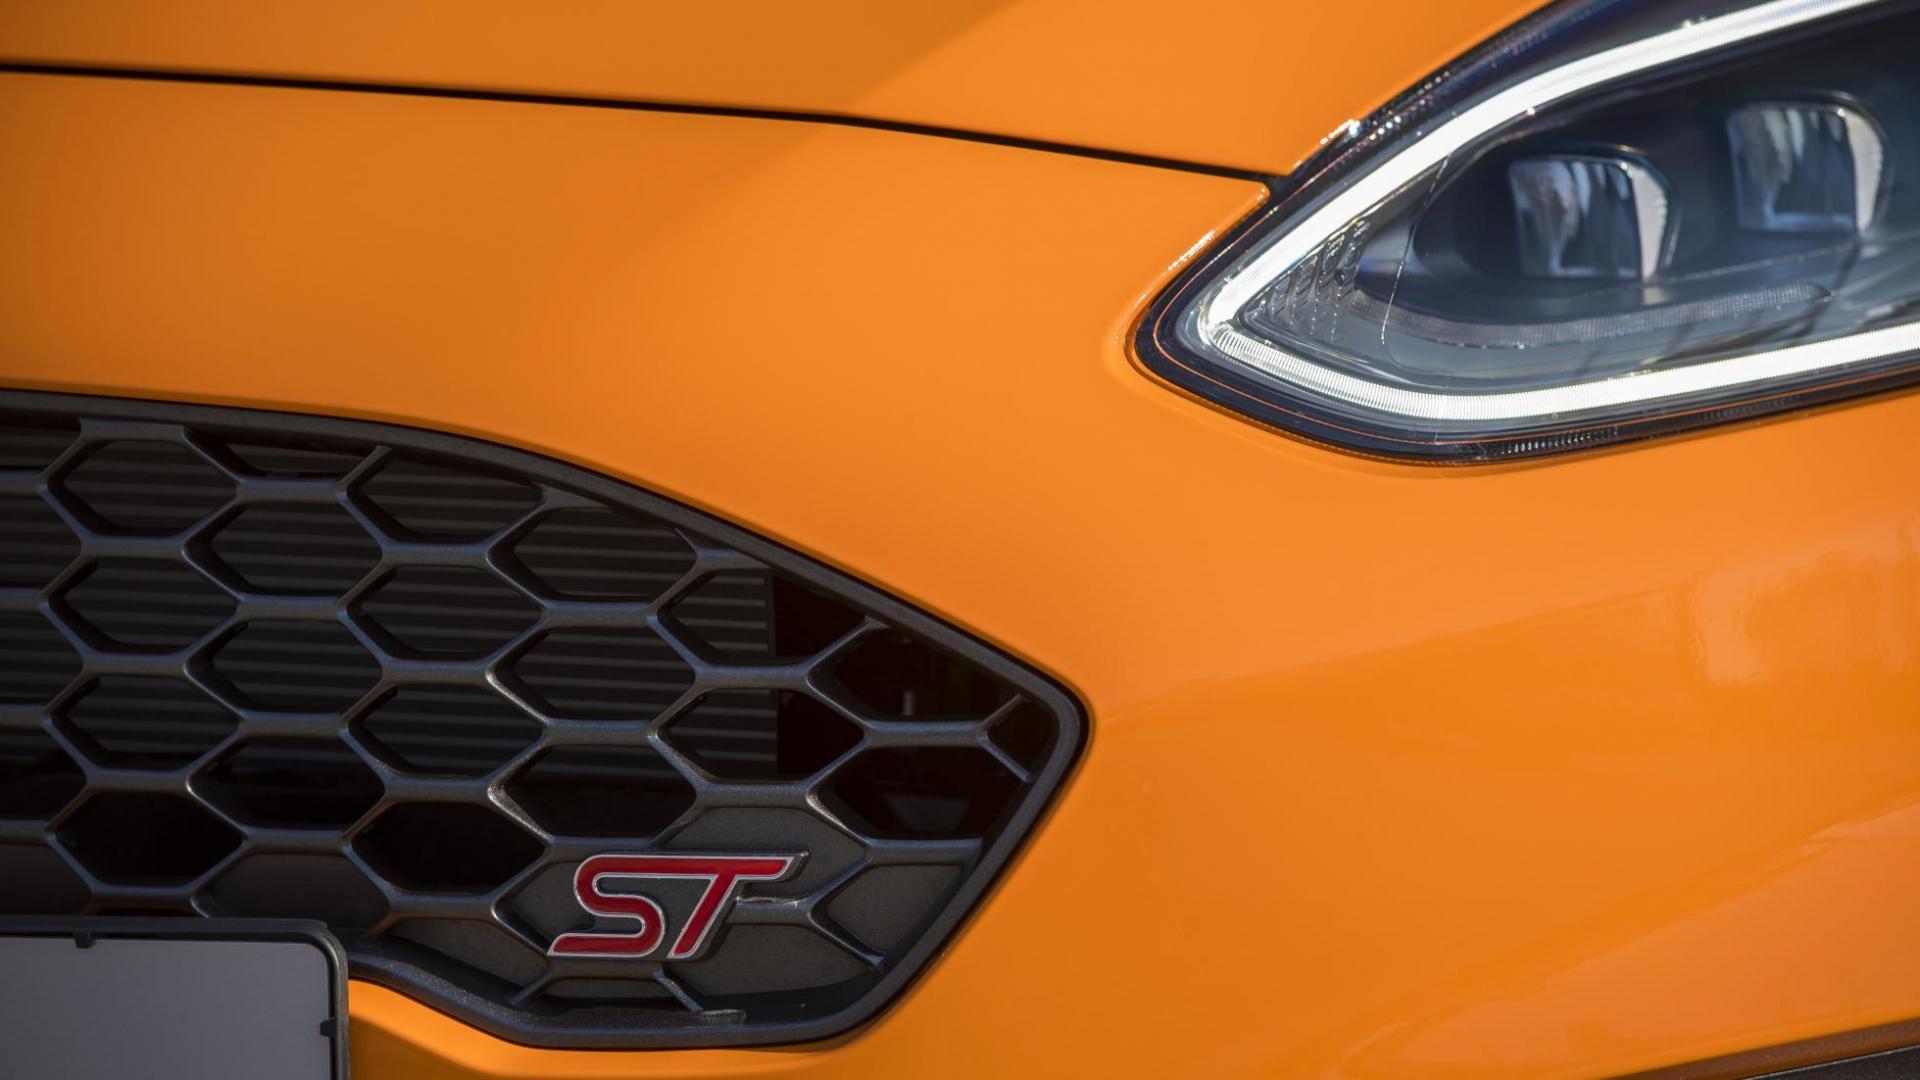 Ford Fiesta ST Performance Edition koplamp